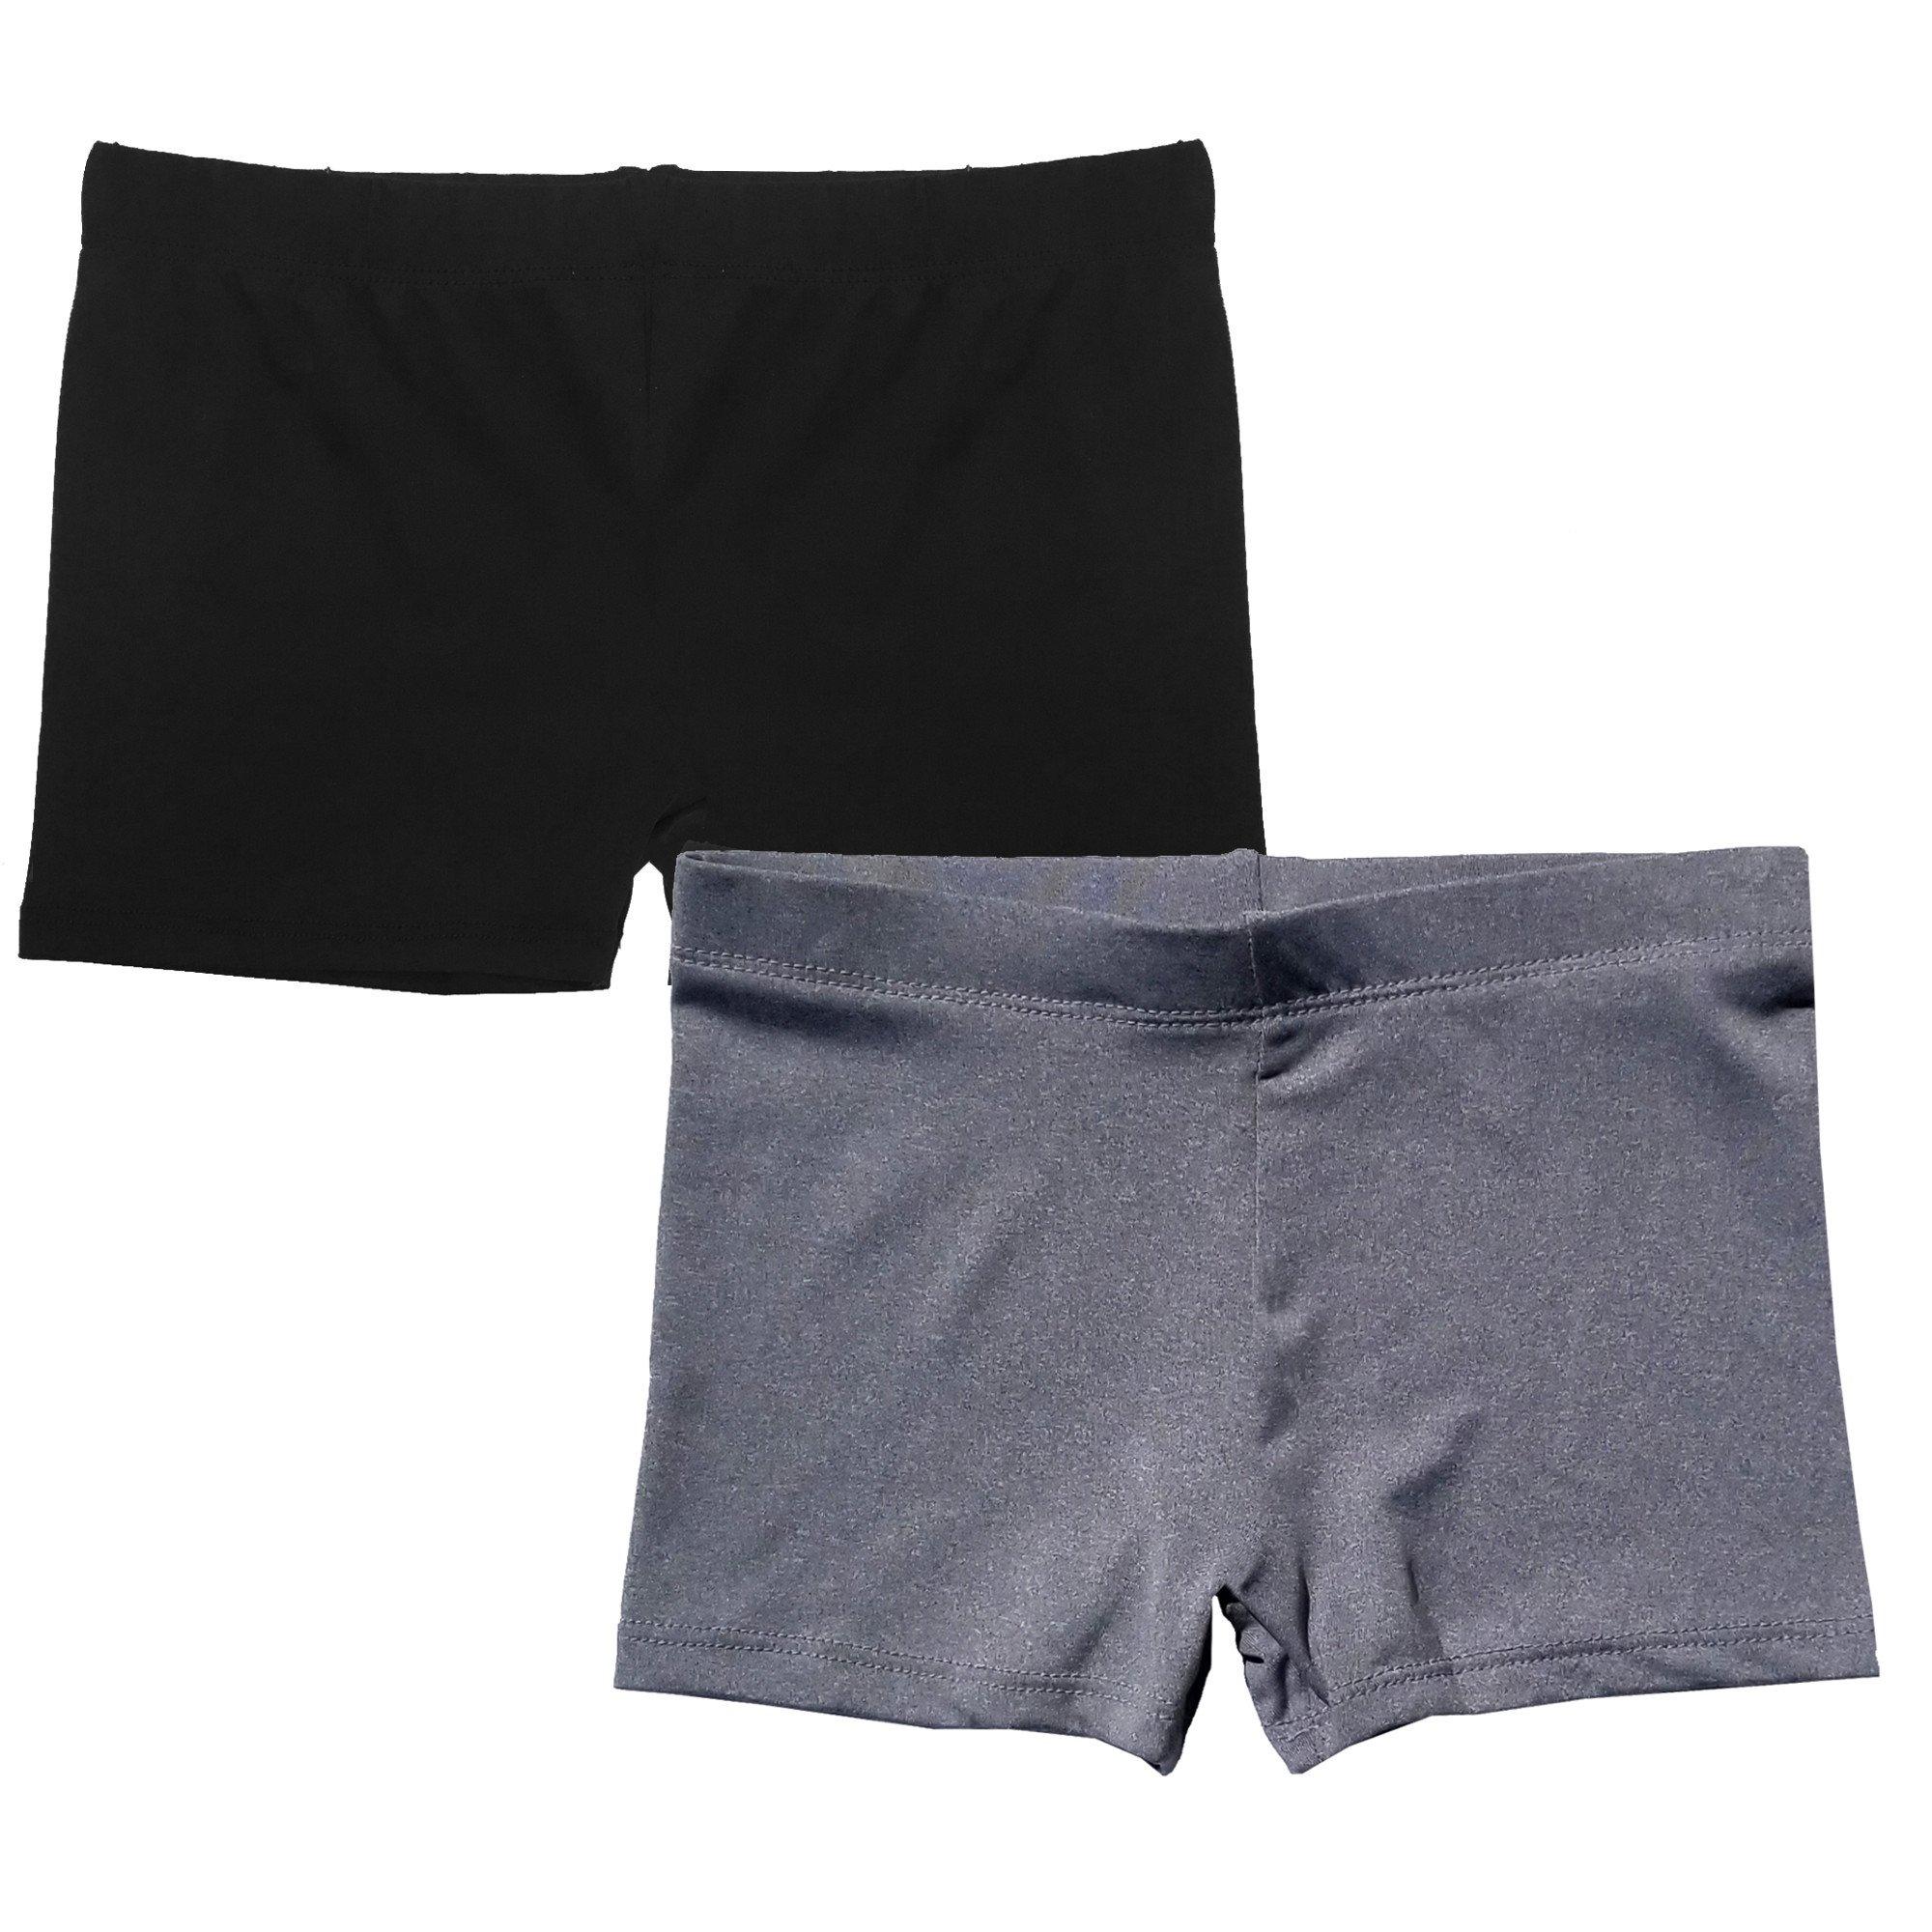 Popular Girl's Premium Playground Shorts - 2 Pack - Black and Grey - S